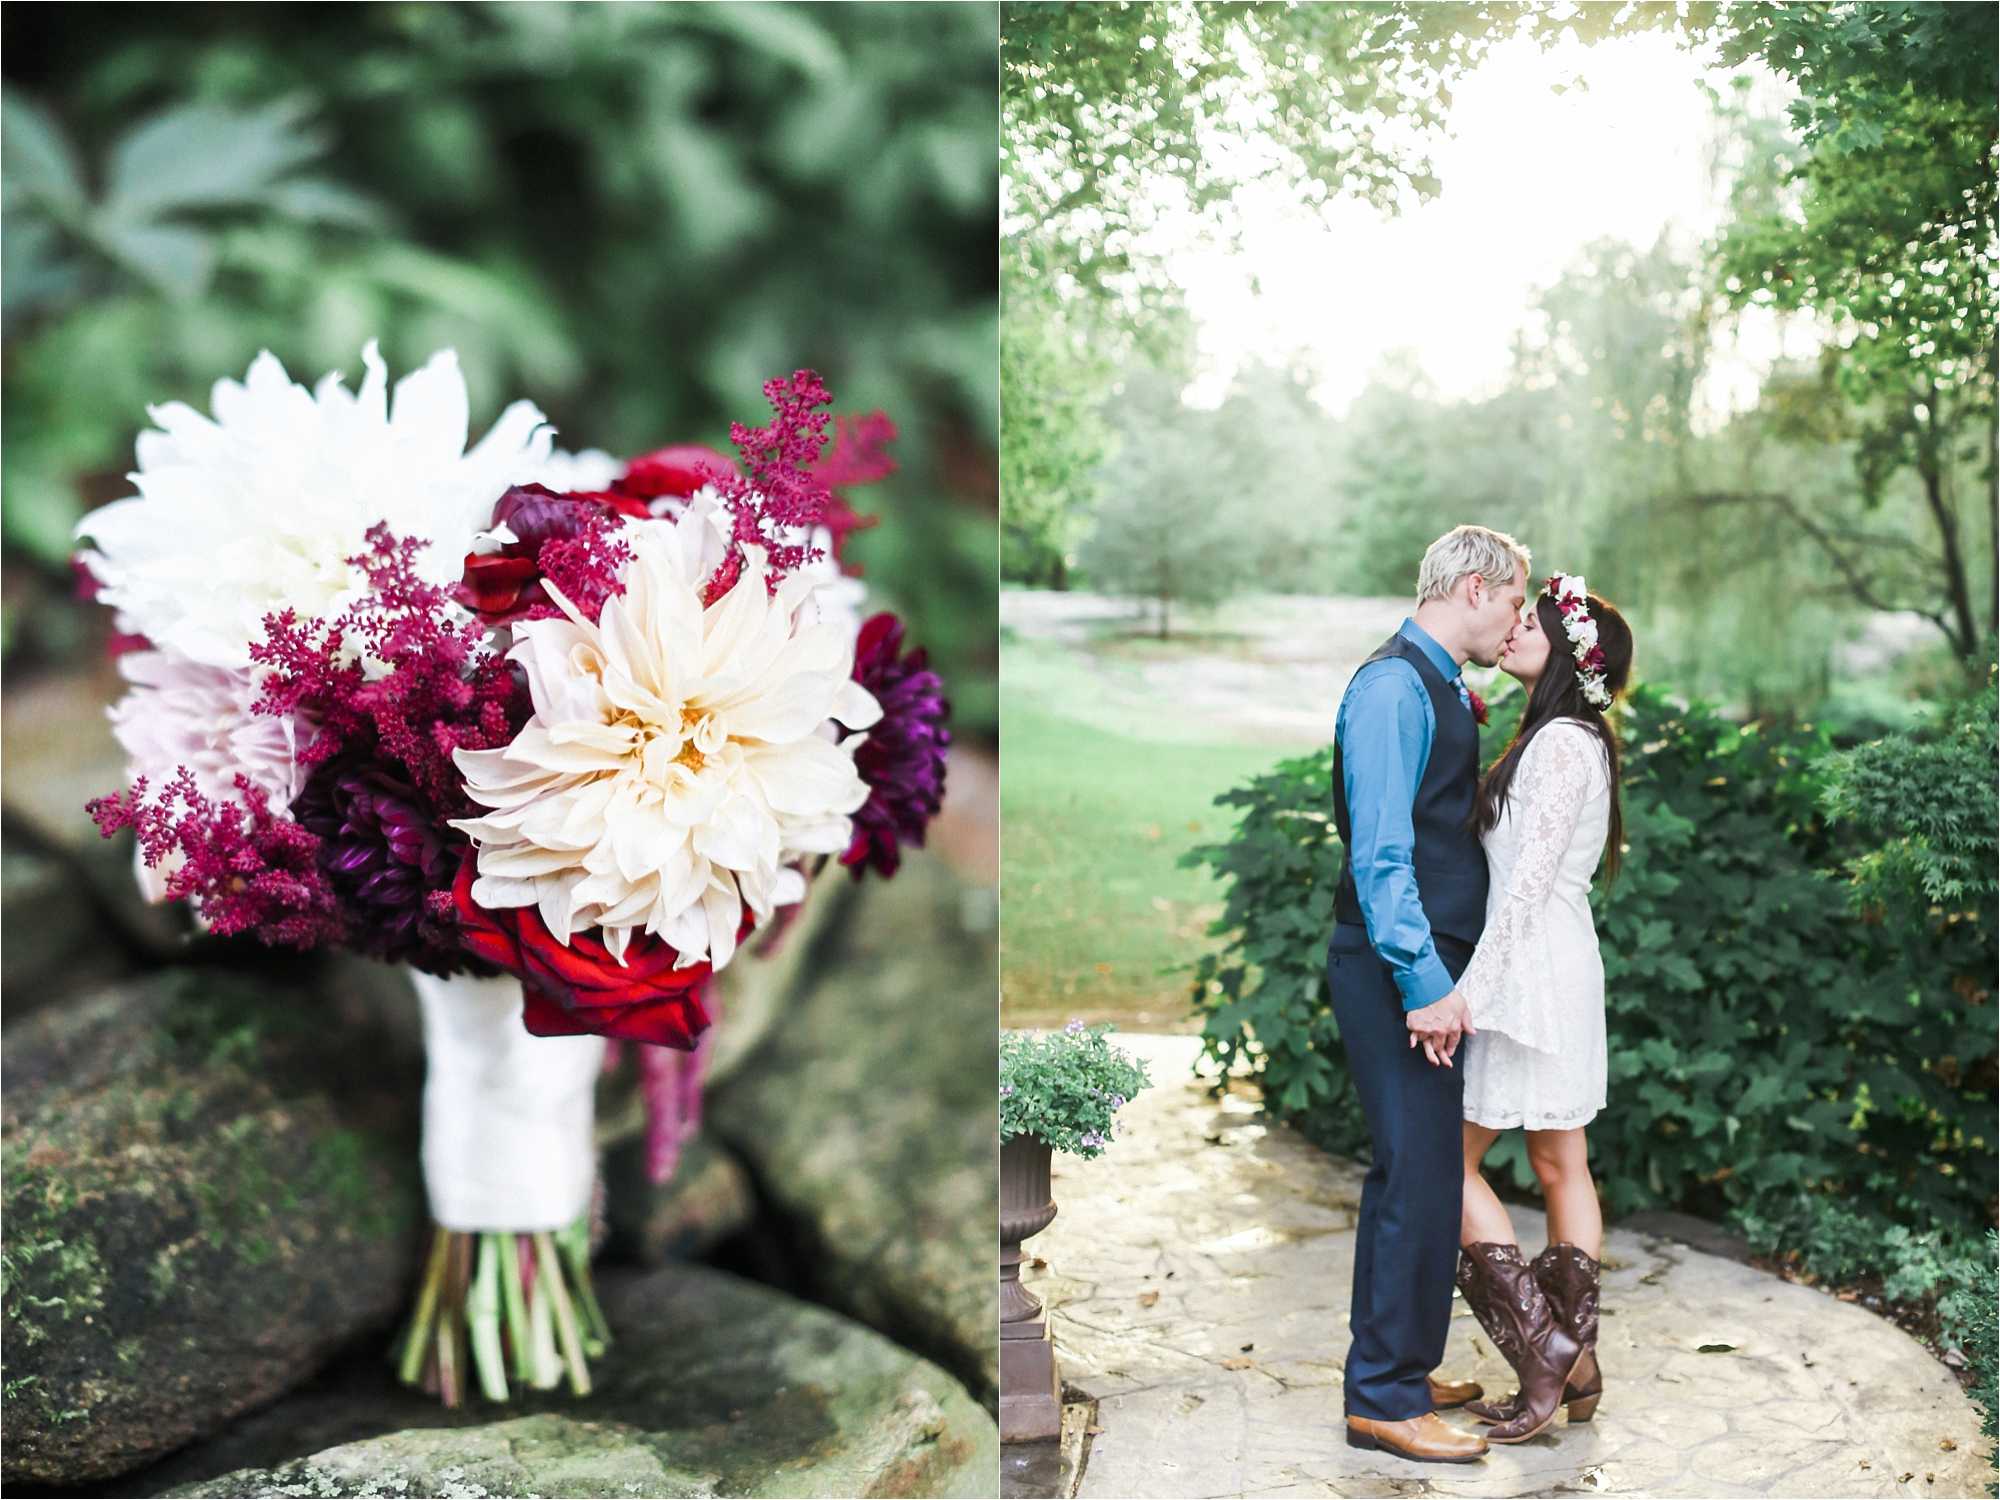 stephanie-yonce-photography-richmond-virginia-bohemian-outdoor-wedding-photo_0033.jpg